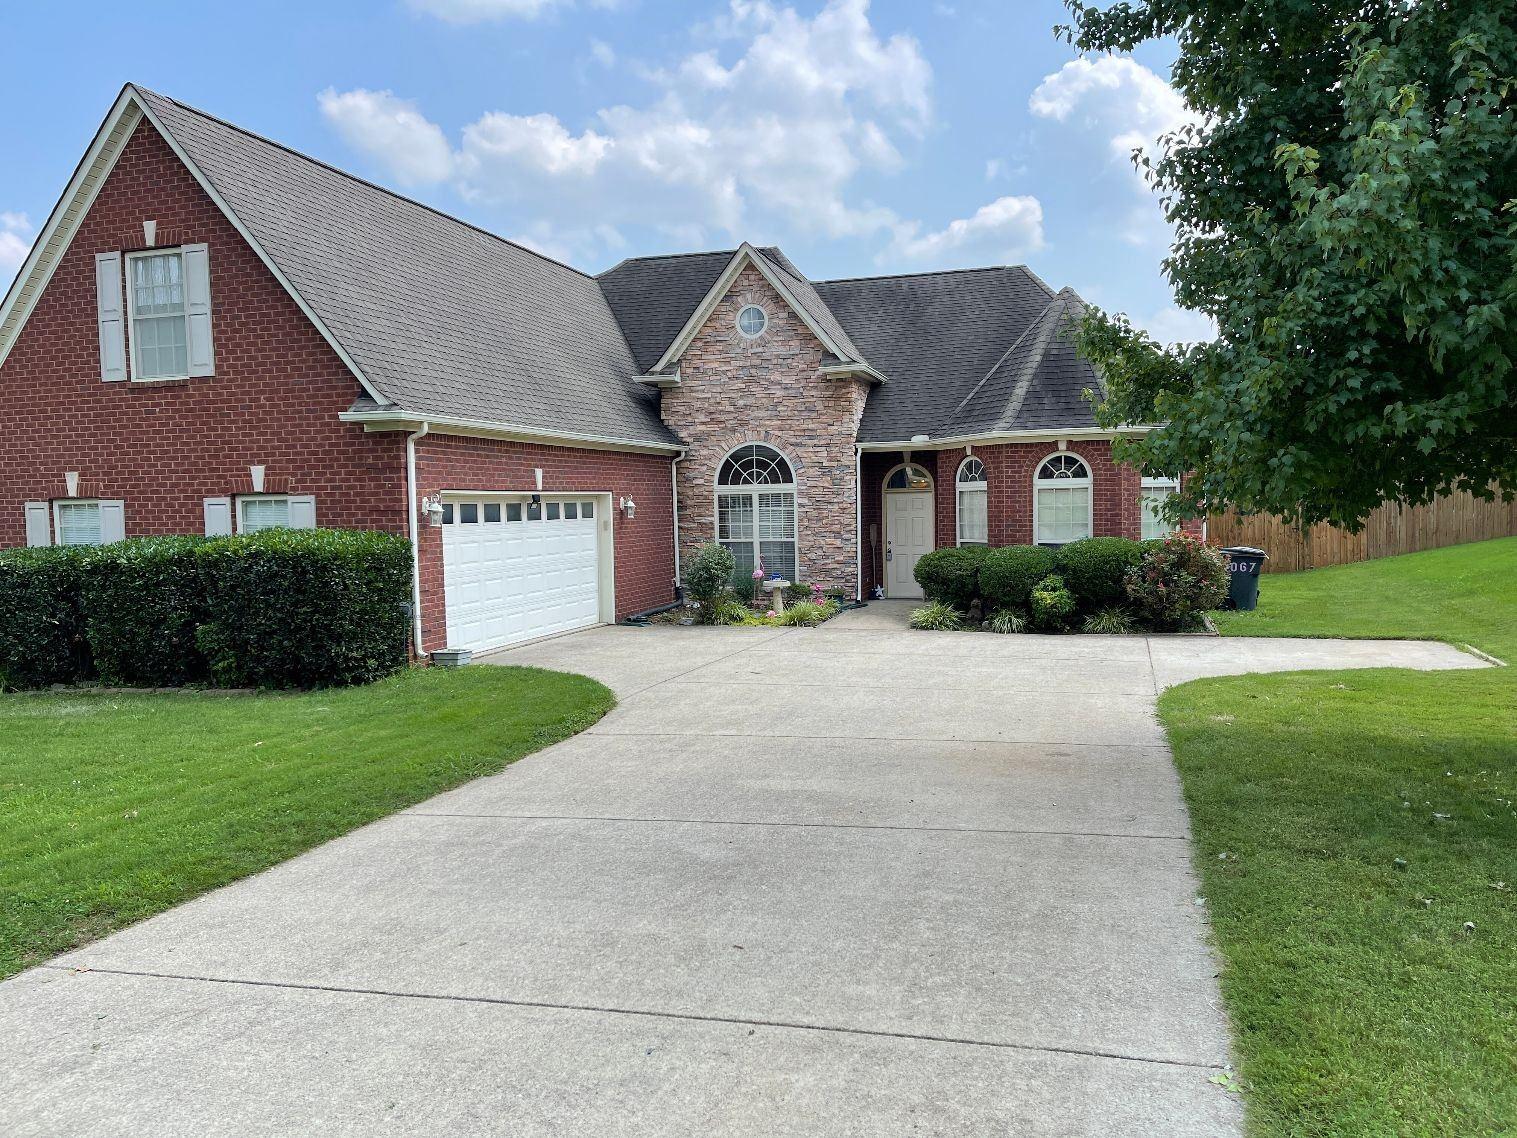 Photo of 1067 Nealcrest Cir, Spring Hill, TN 37174 (MLS # 2275441)